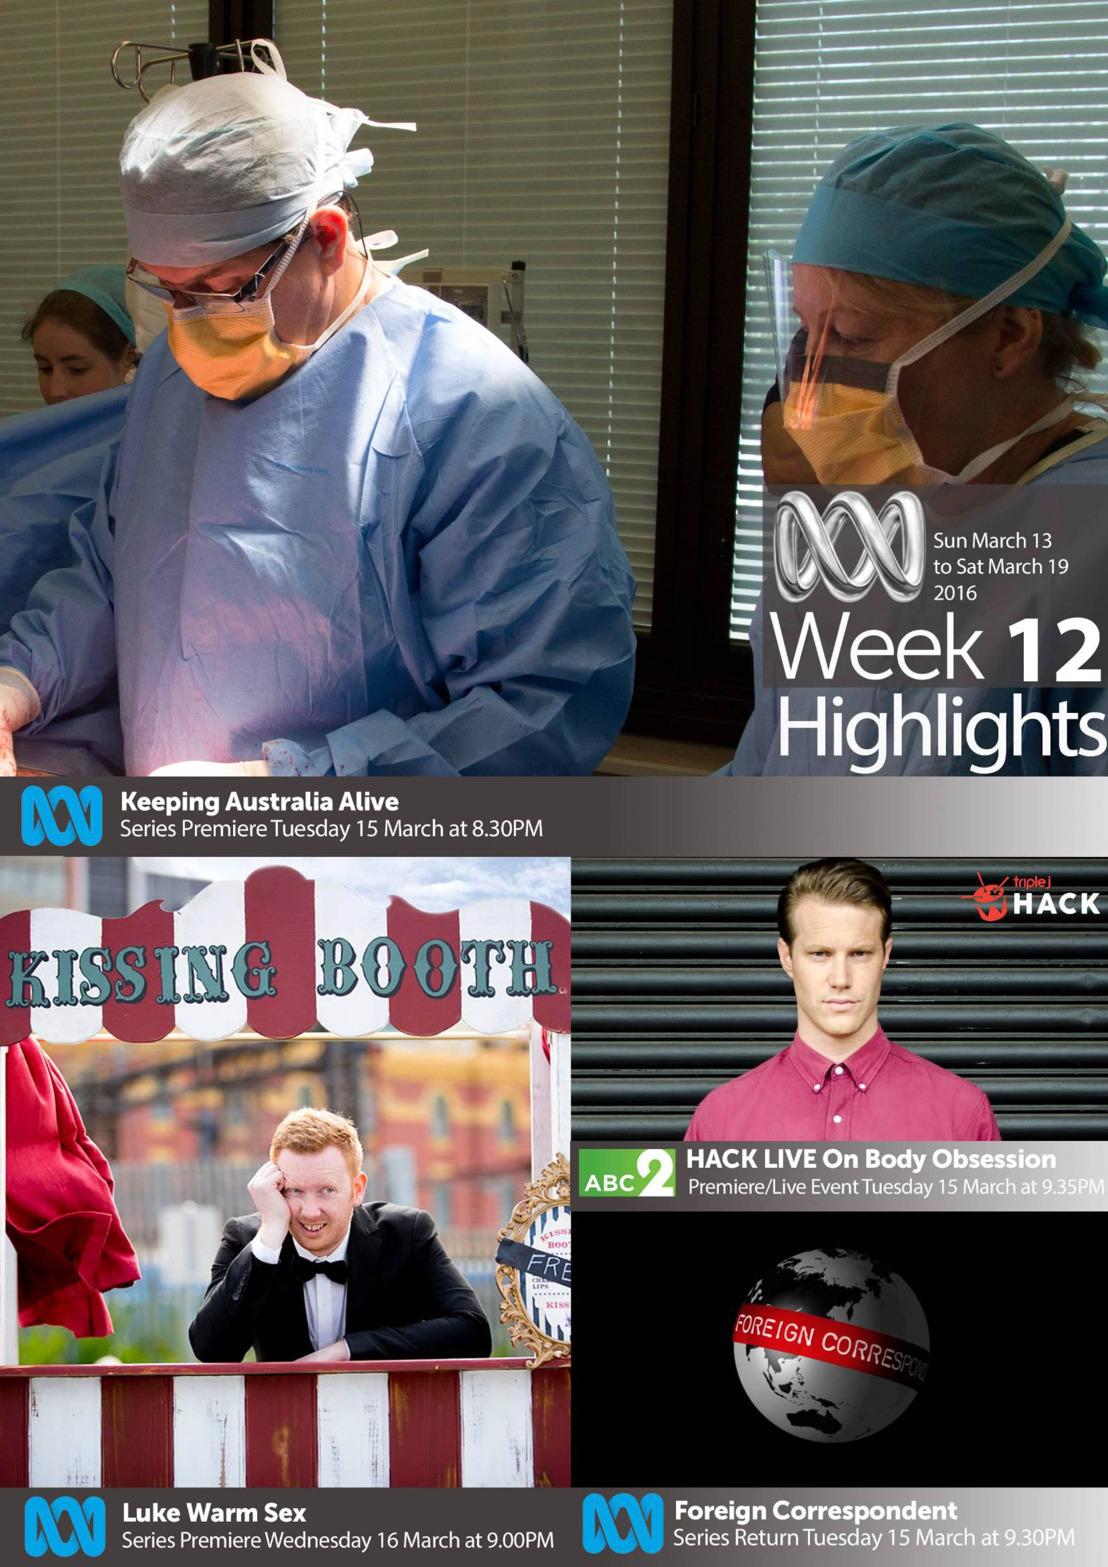 ABC TV Highlights - Week 12